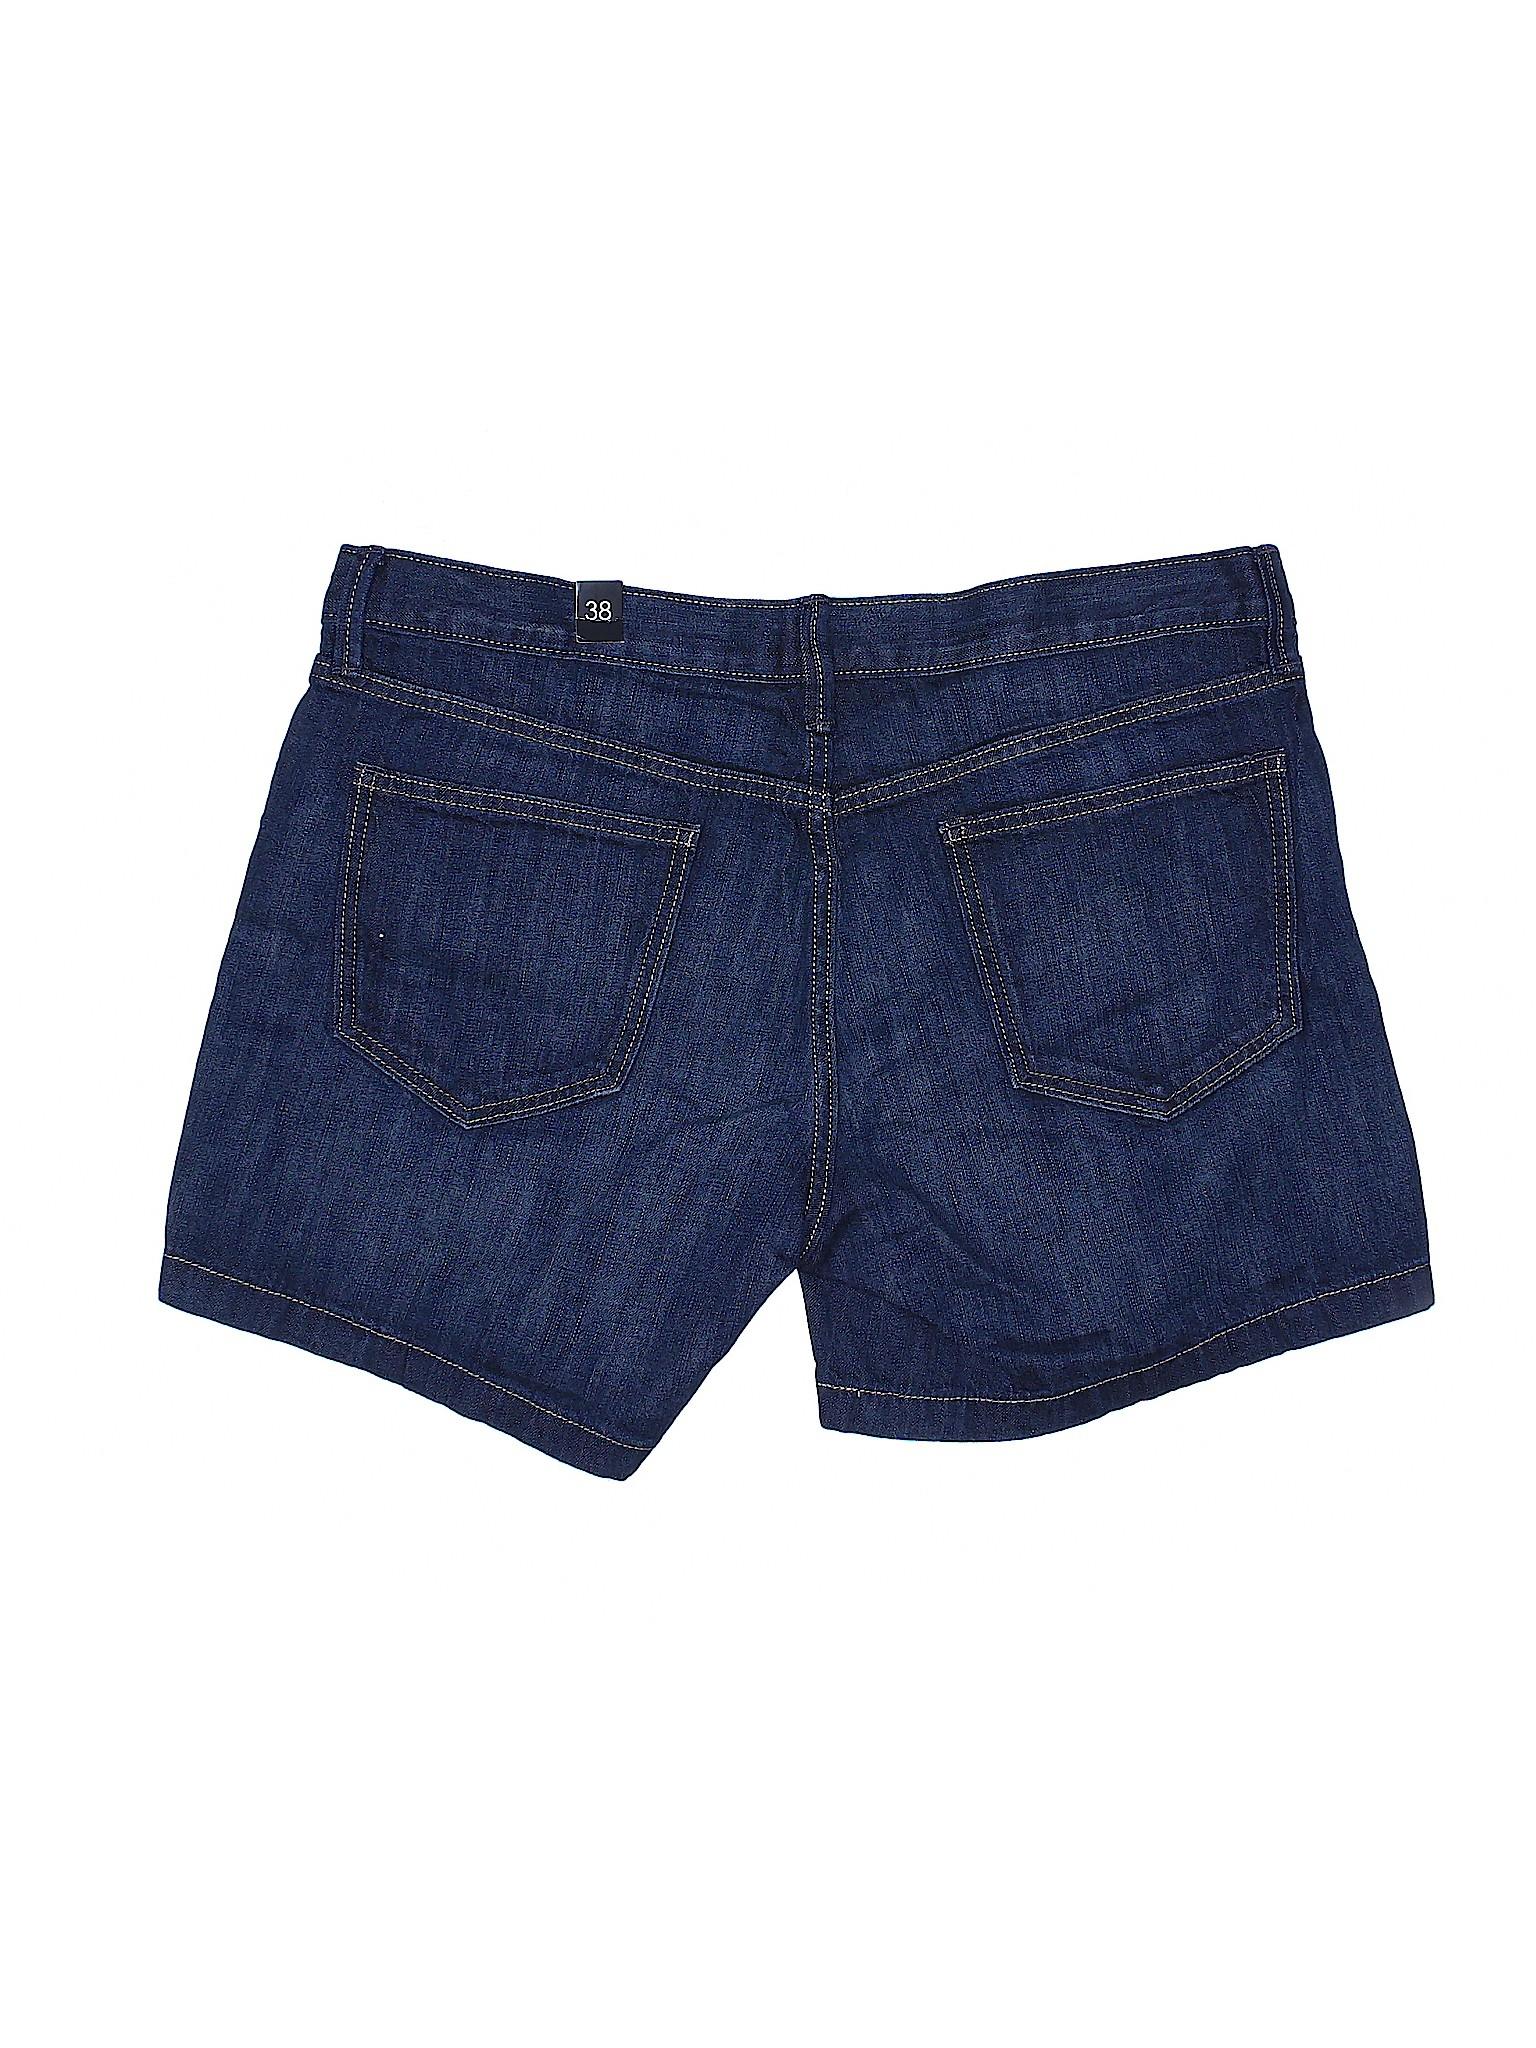 Shorts Denim Boutique Martha amp; George qxTwI7wX